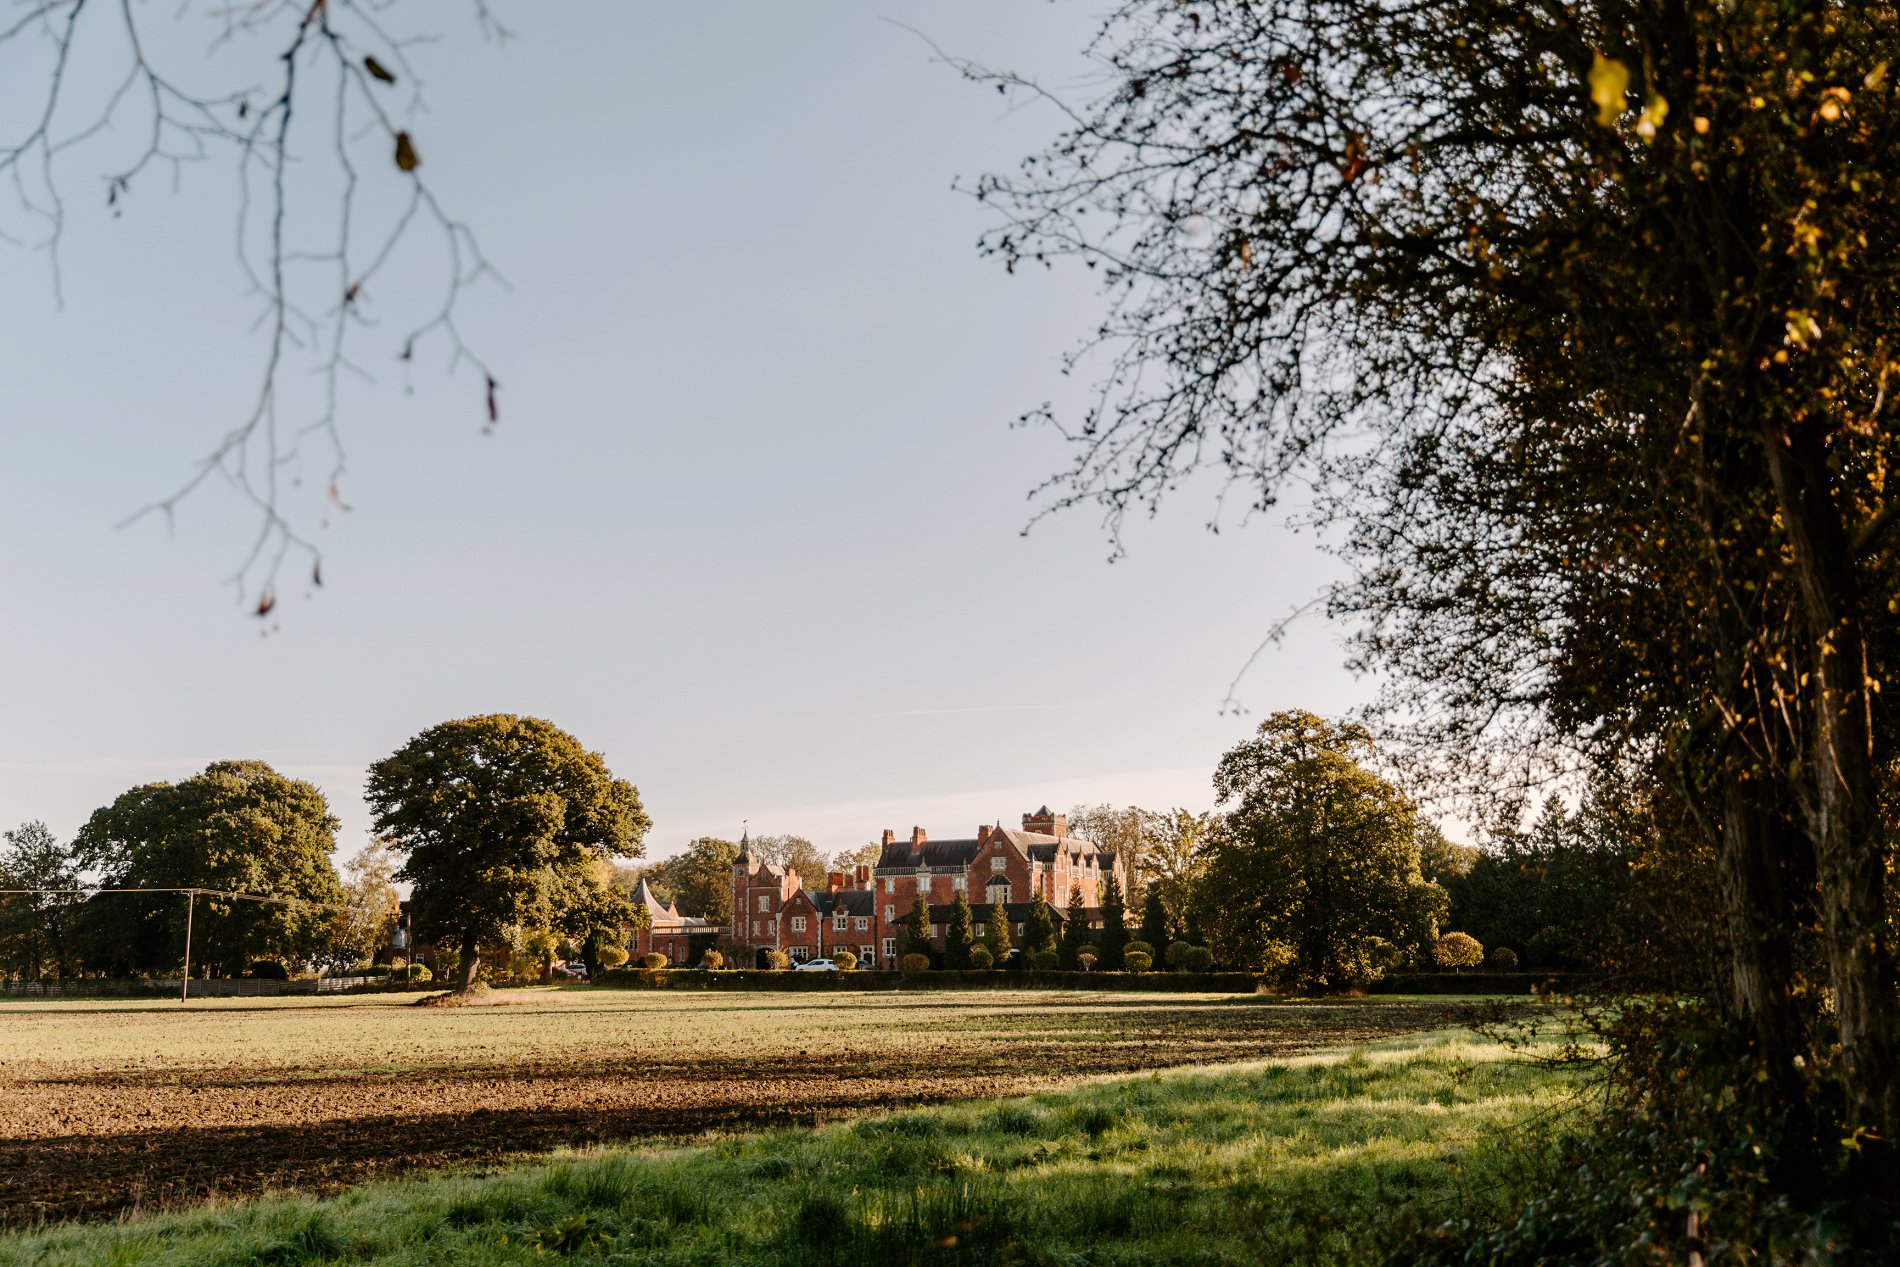 An Elegant White Wedding at Thicket Priory (c) Carla Whittingham Photography (1)